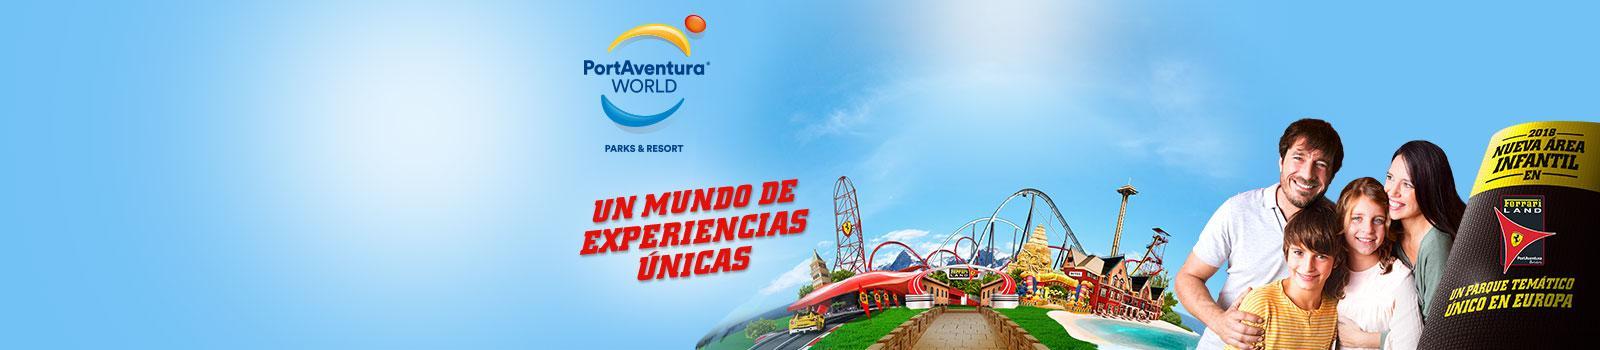 Oferta Hotel + Entrada Port aventura